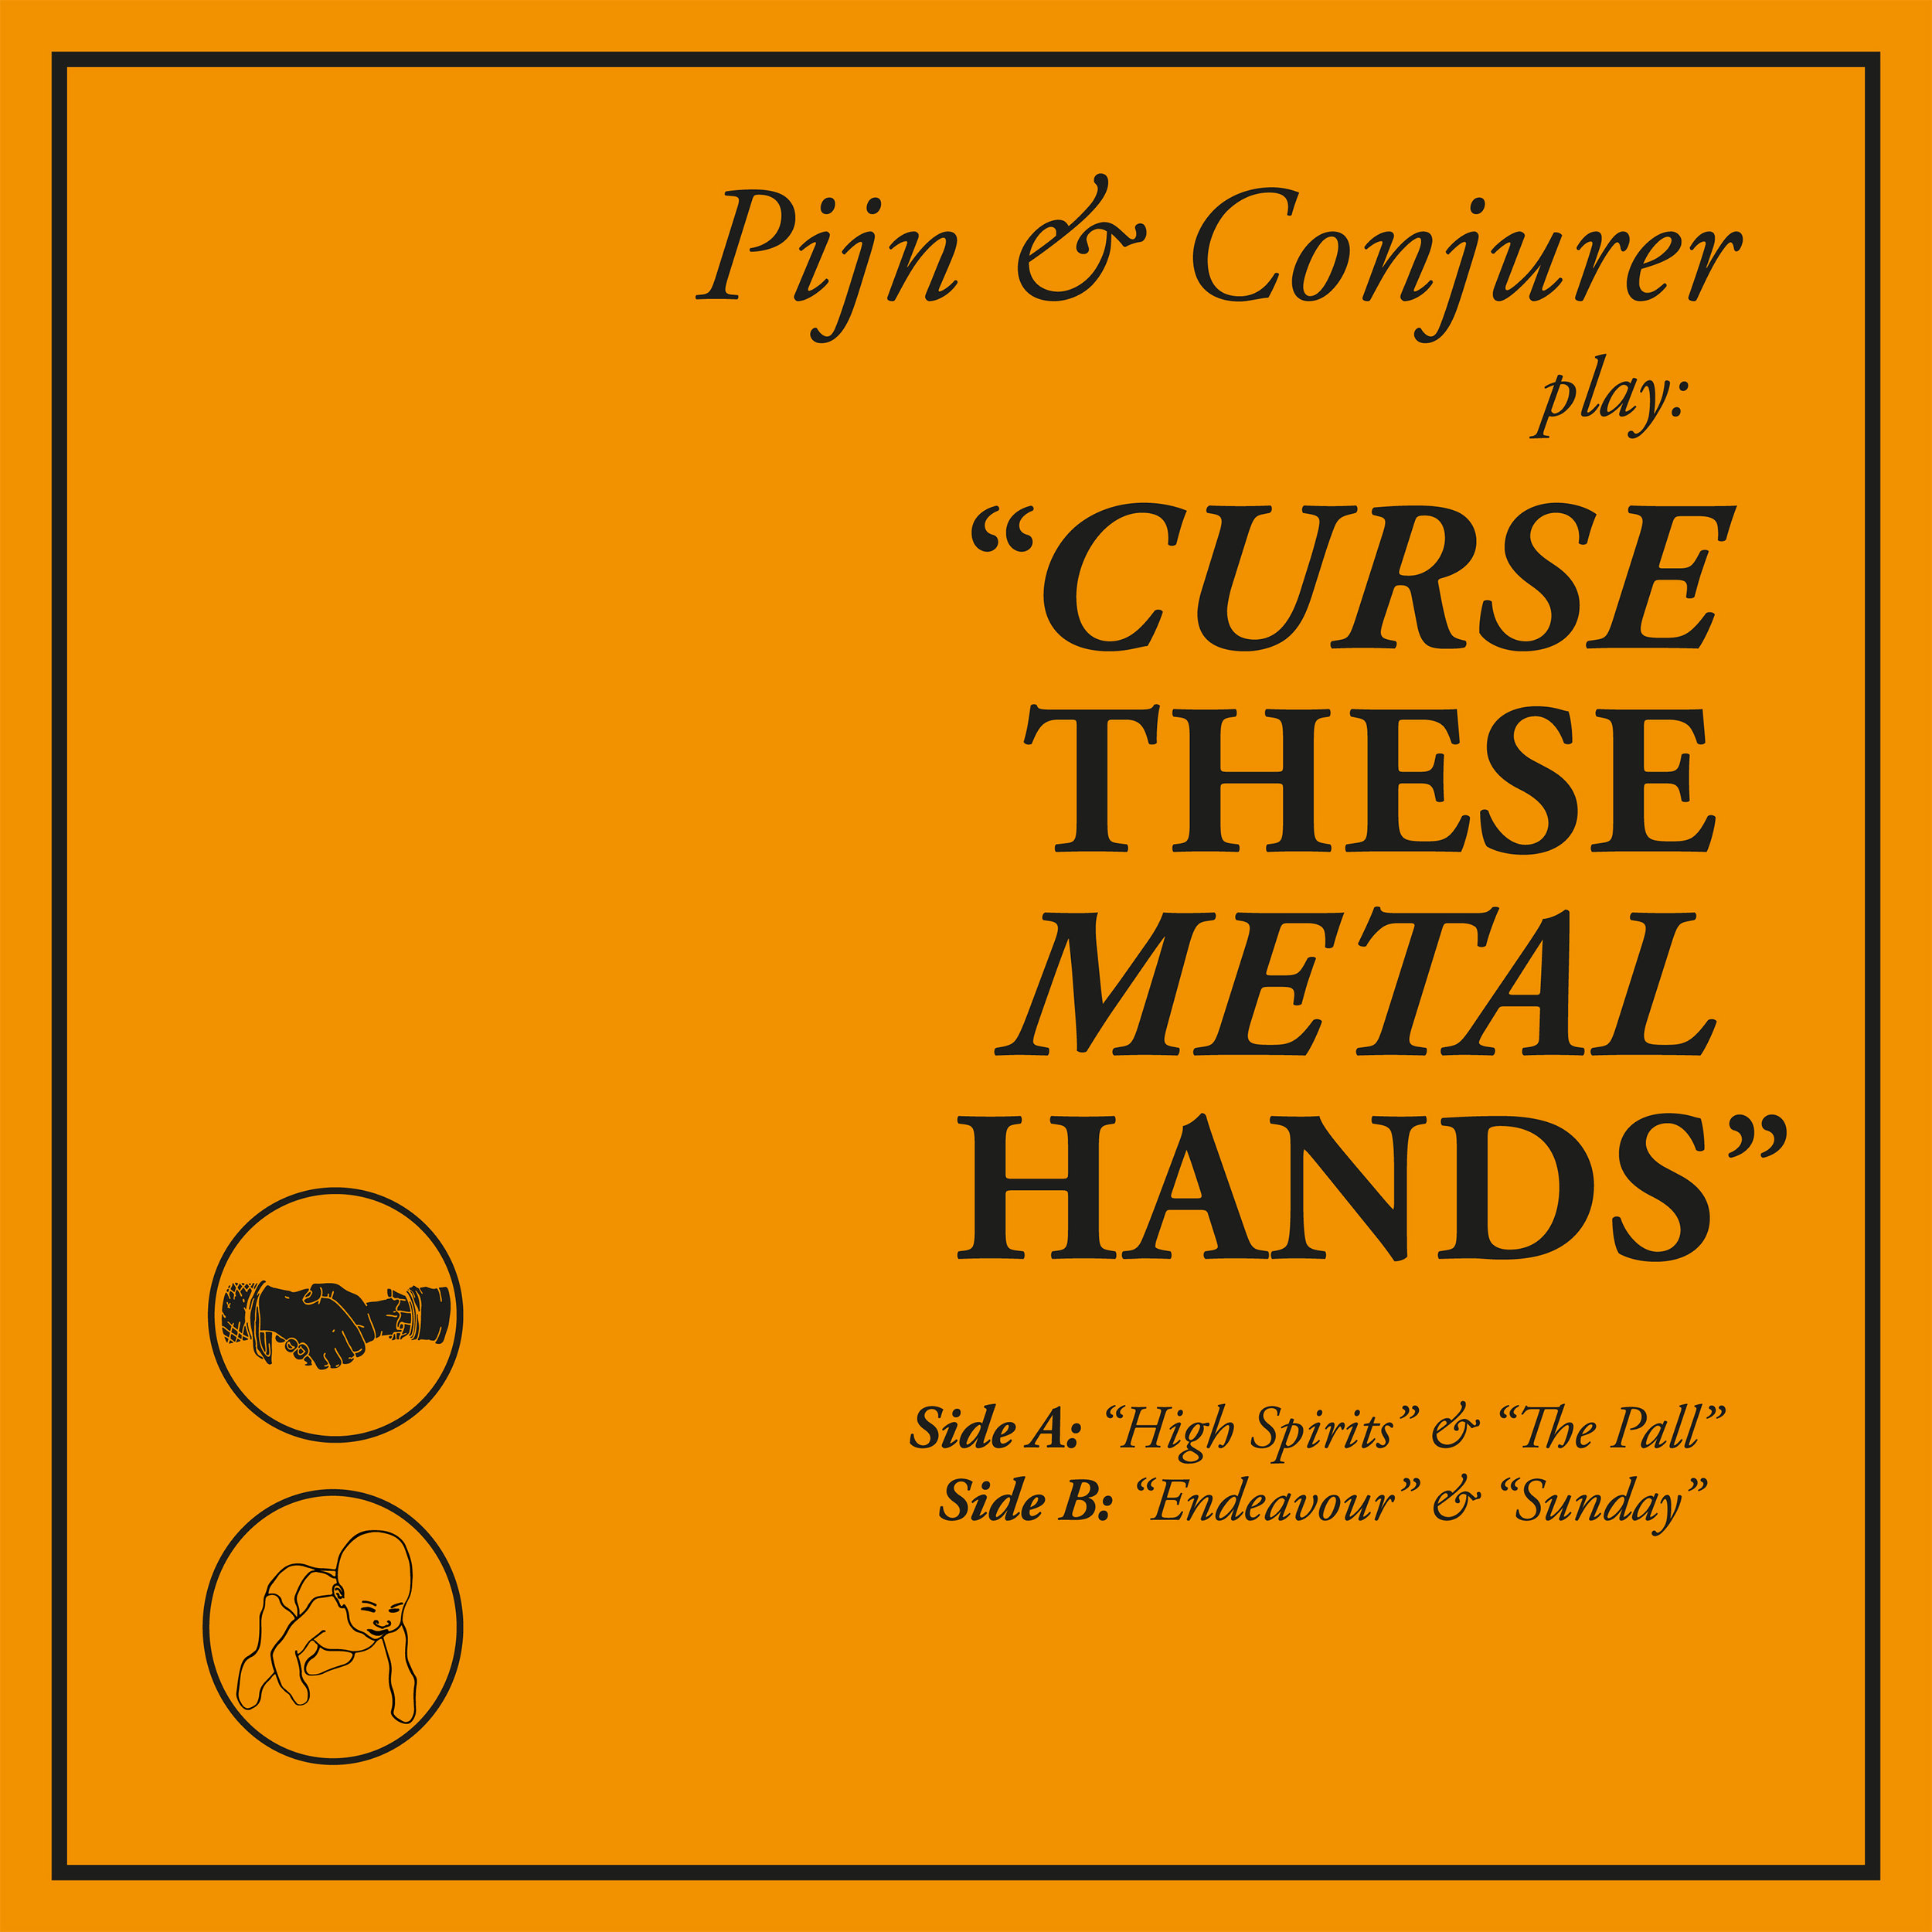 Curse These Metal Hands - digi cover 3000 x 3000.jpg